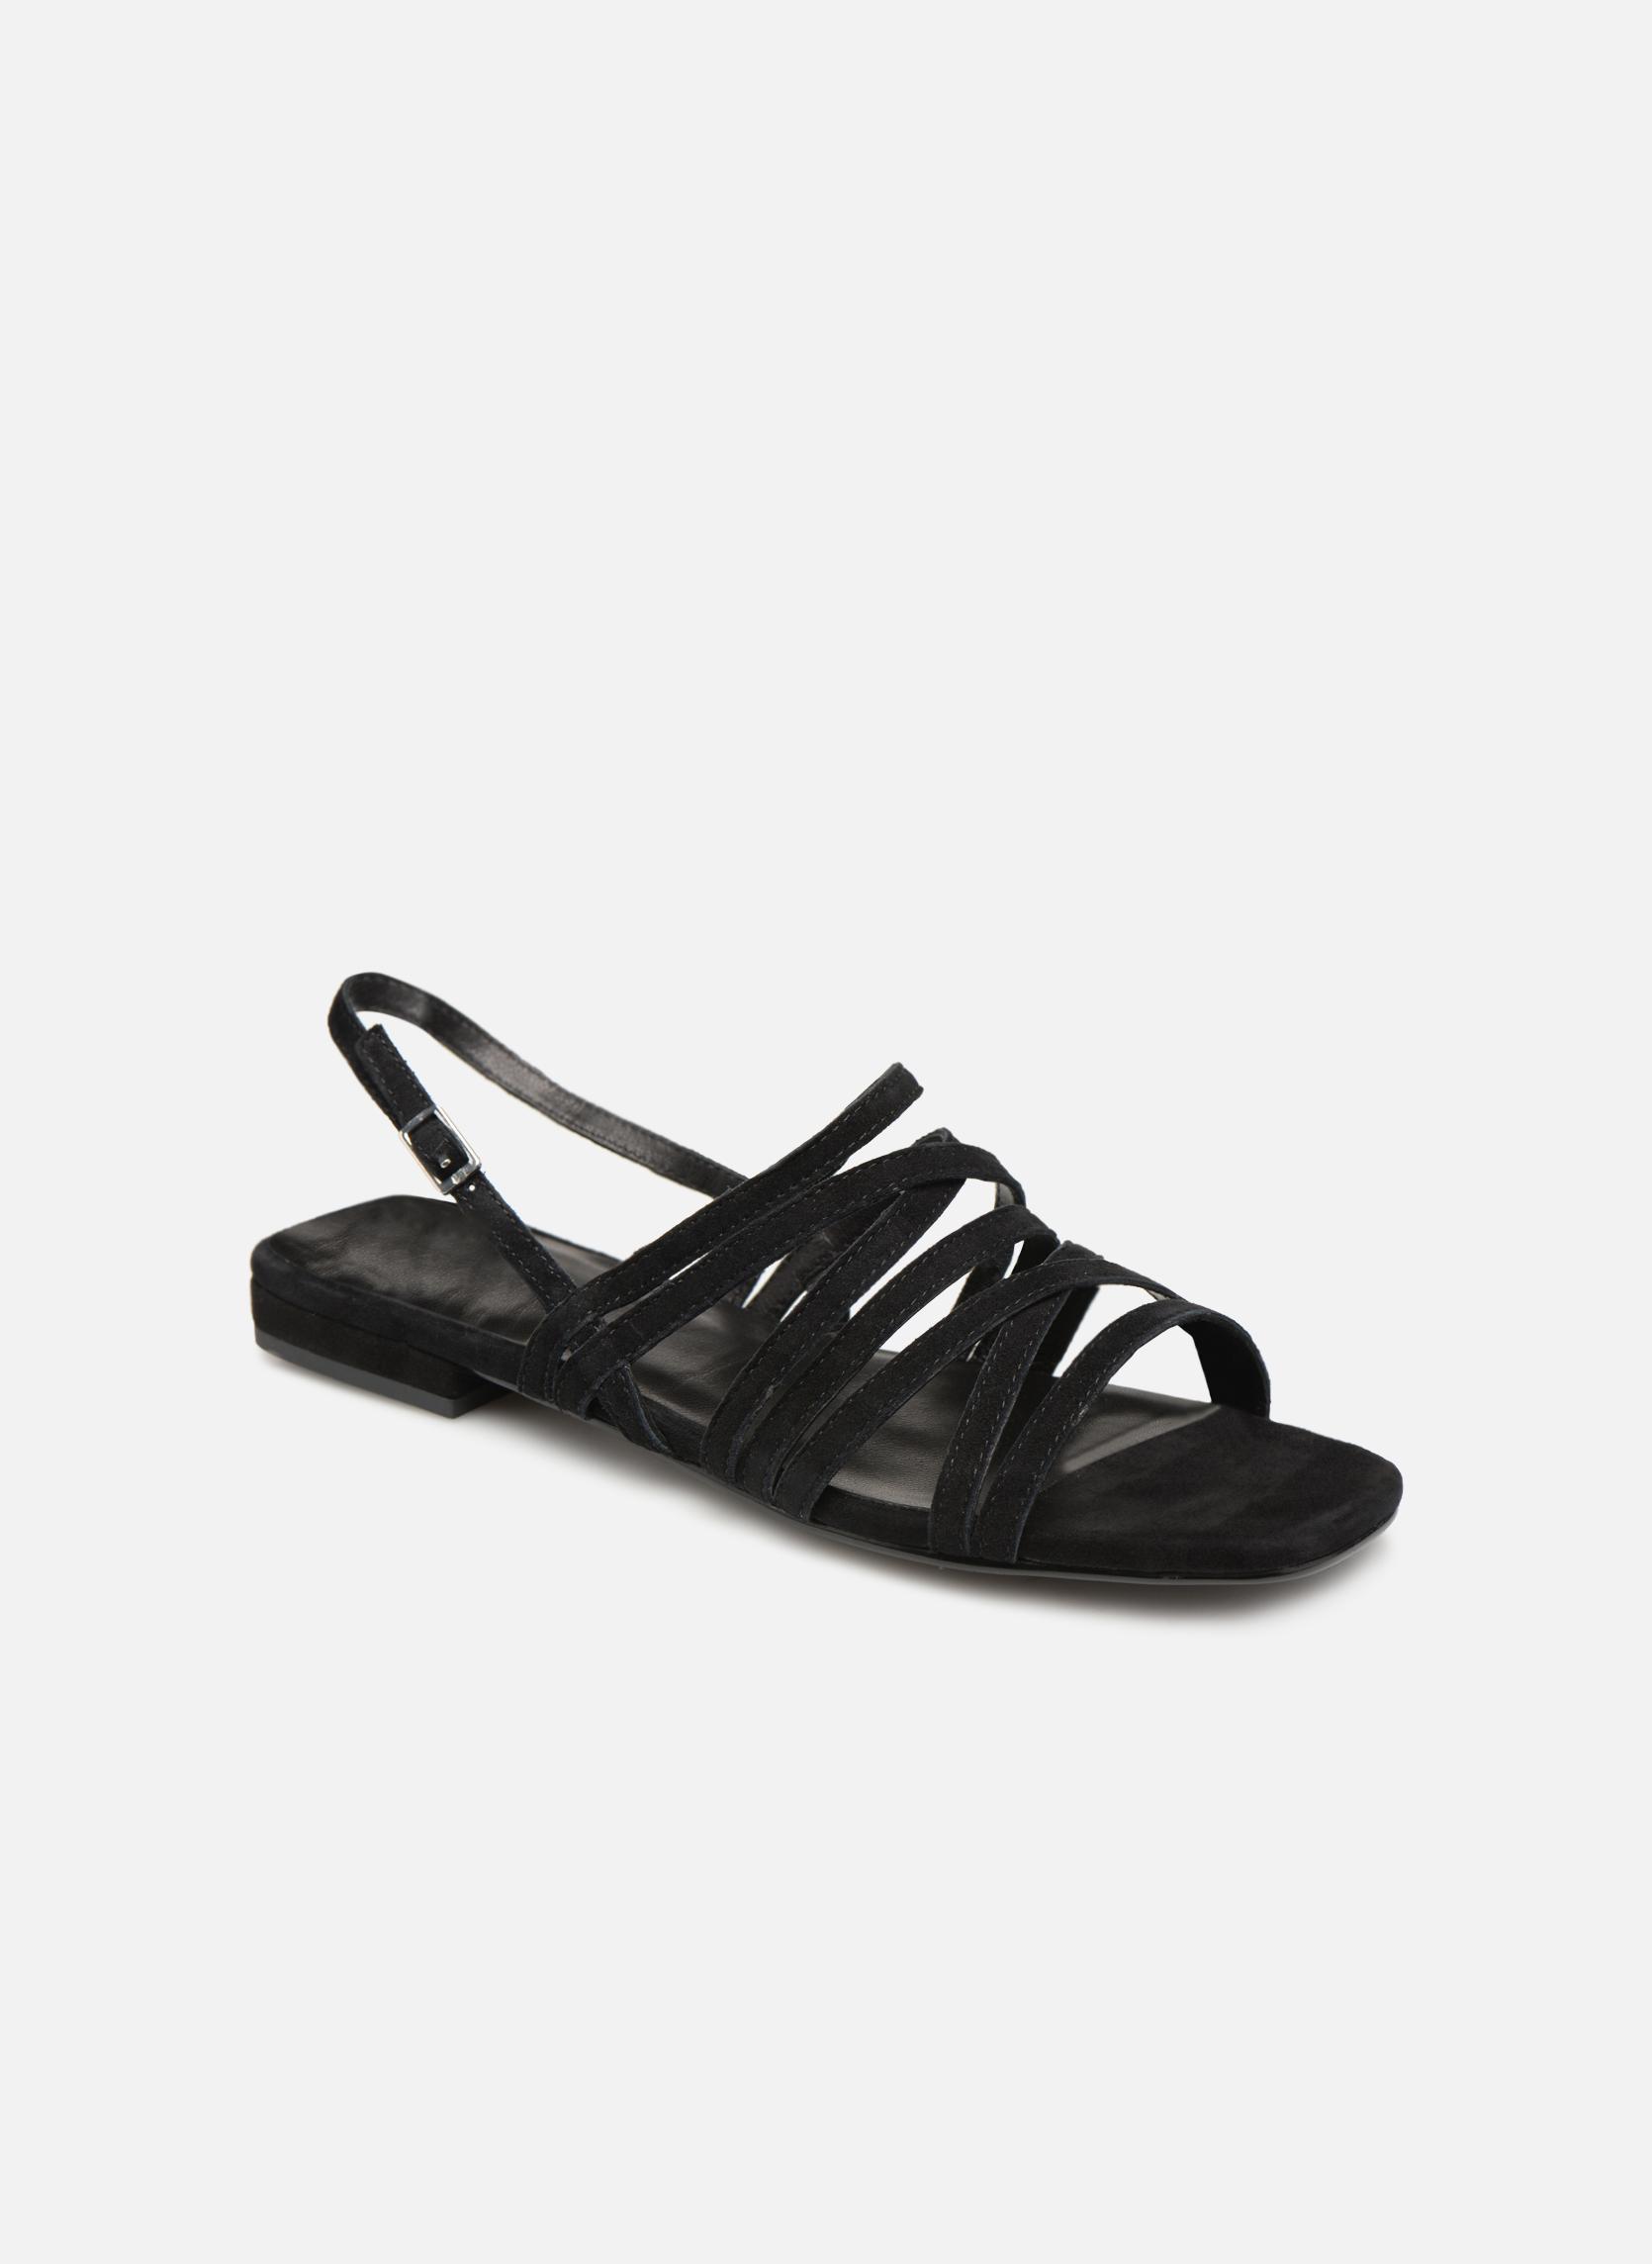 Becky 4715-140 par Vagabond Shoemakers